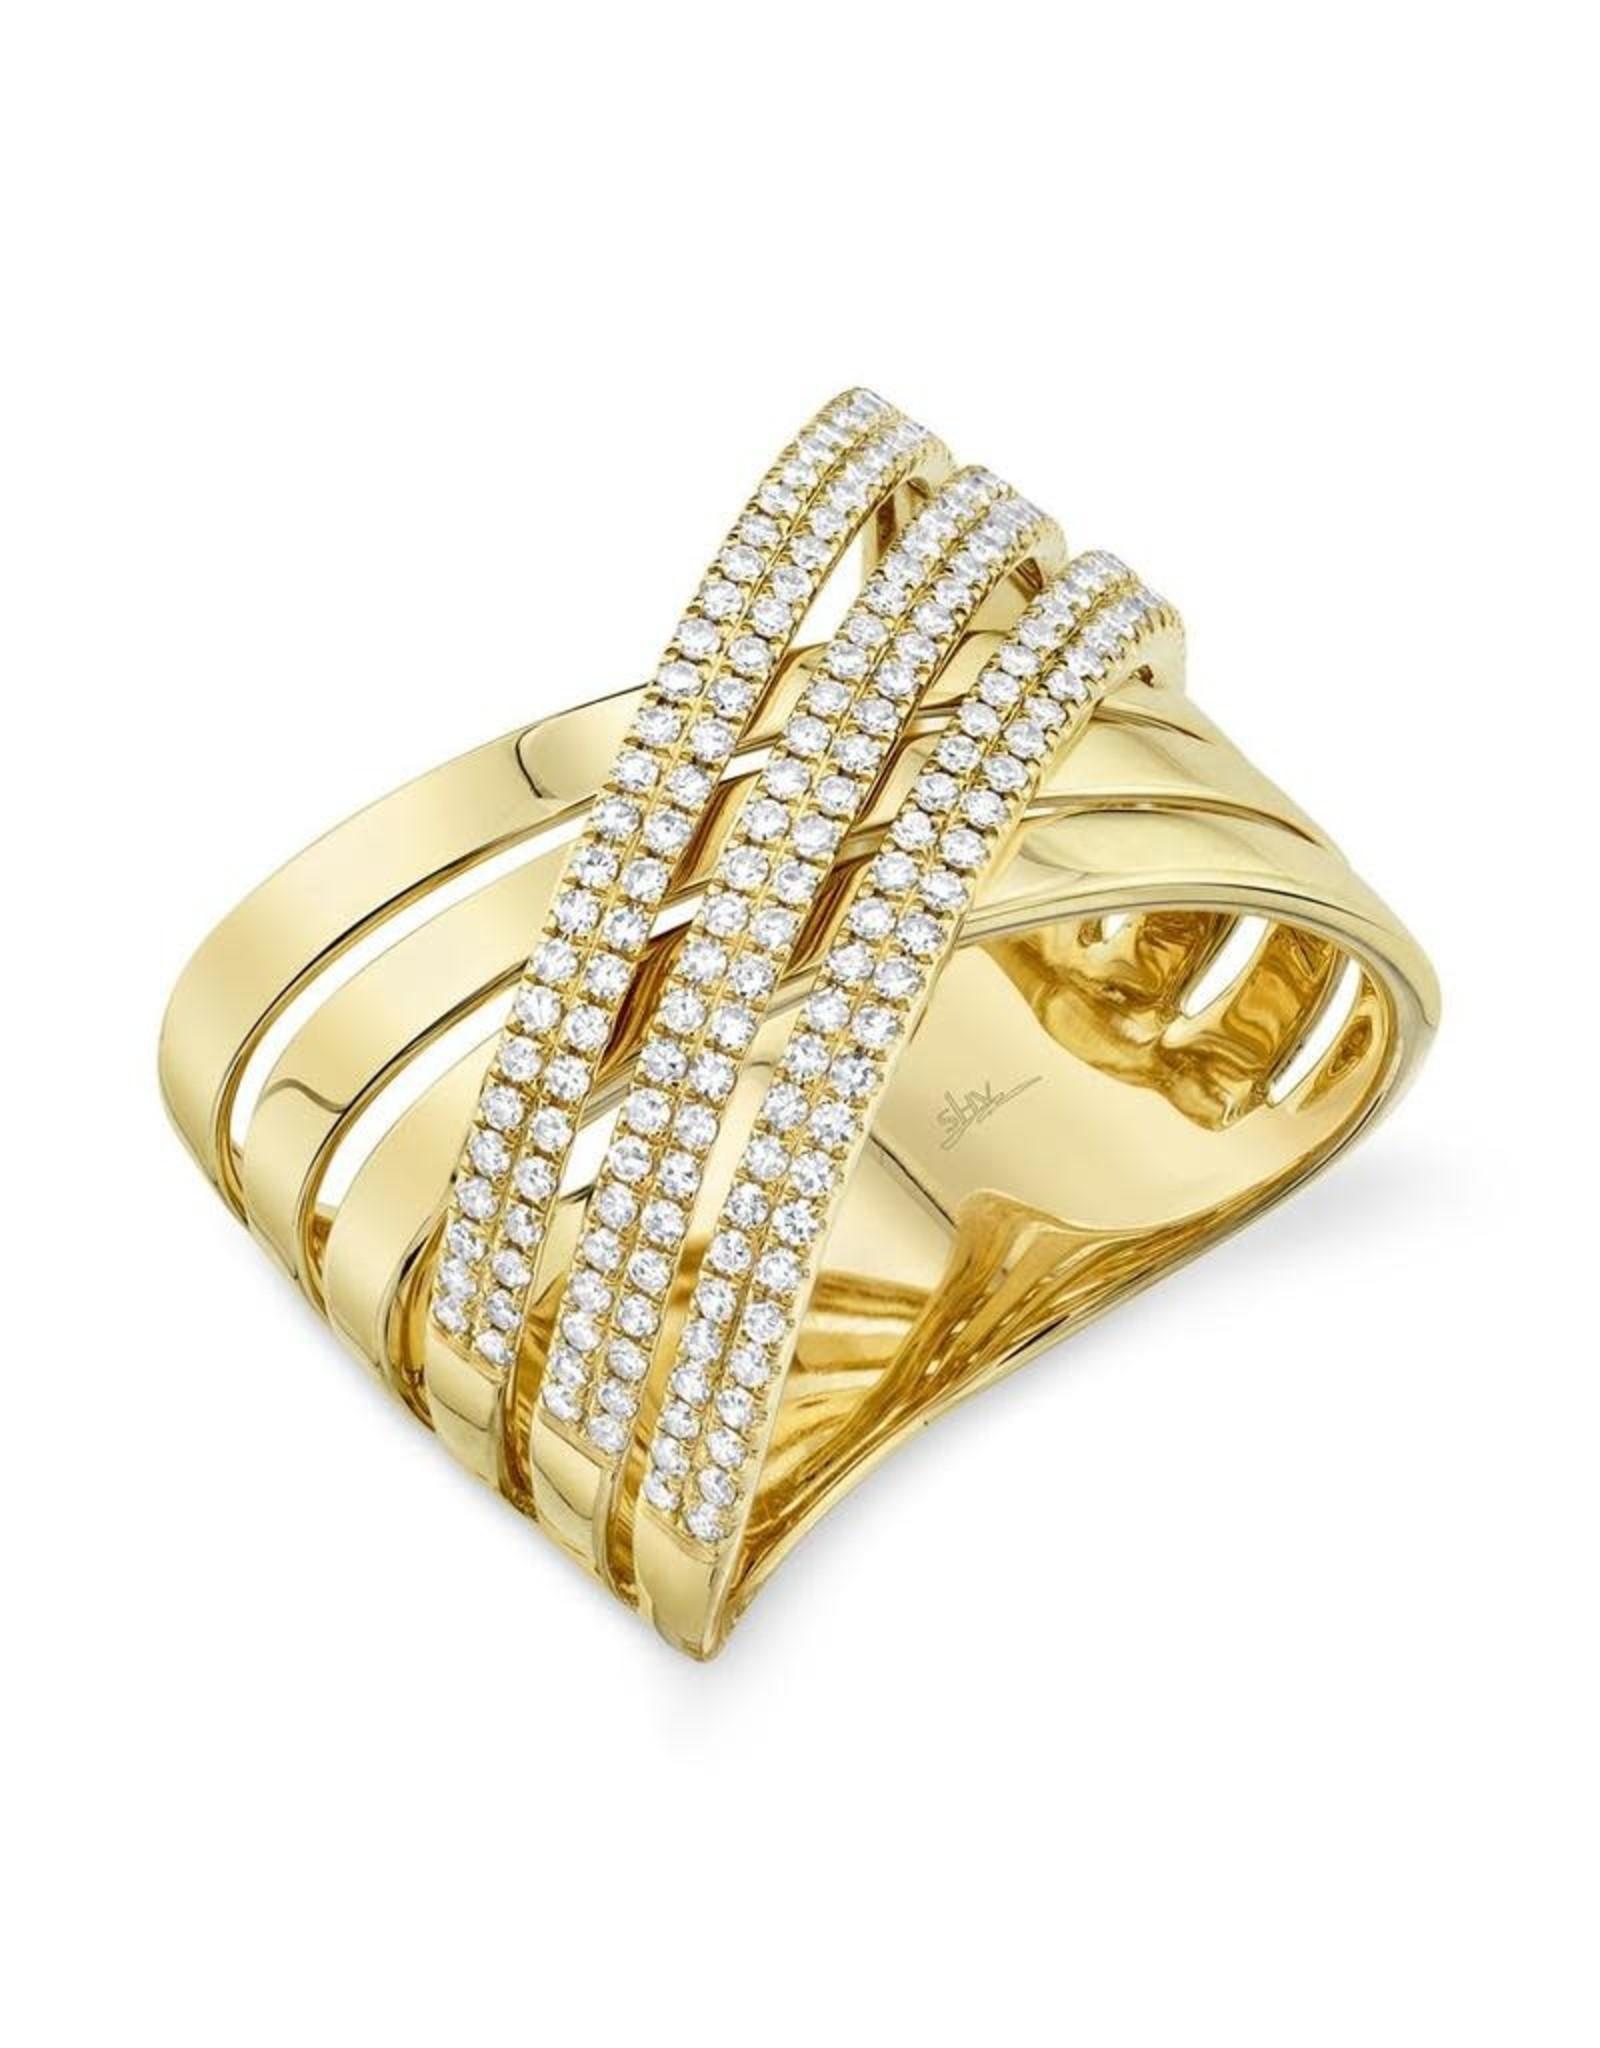 14K Yellow Gold  Criss Cross Diamond Ring, D: 0.54ct